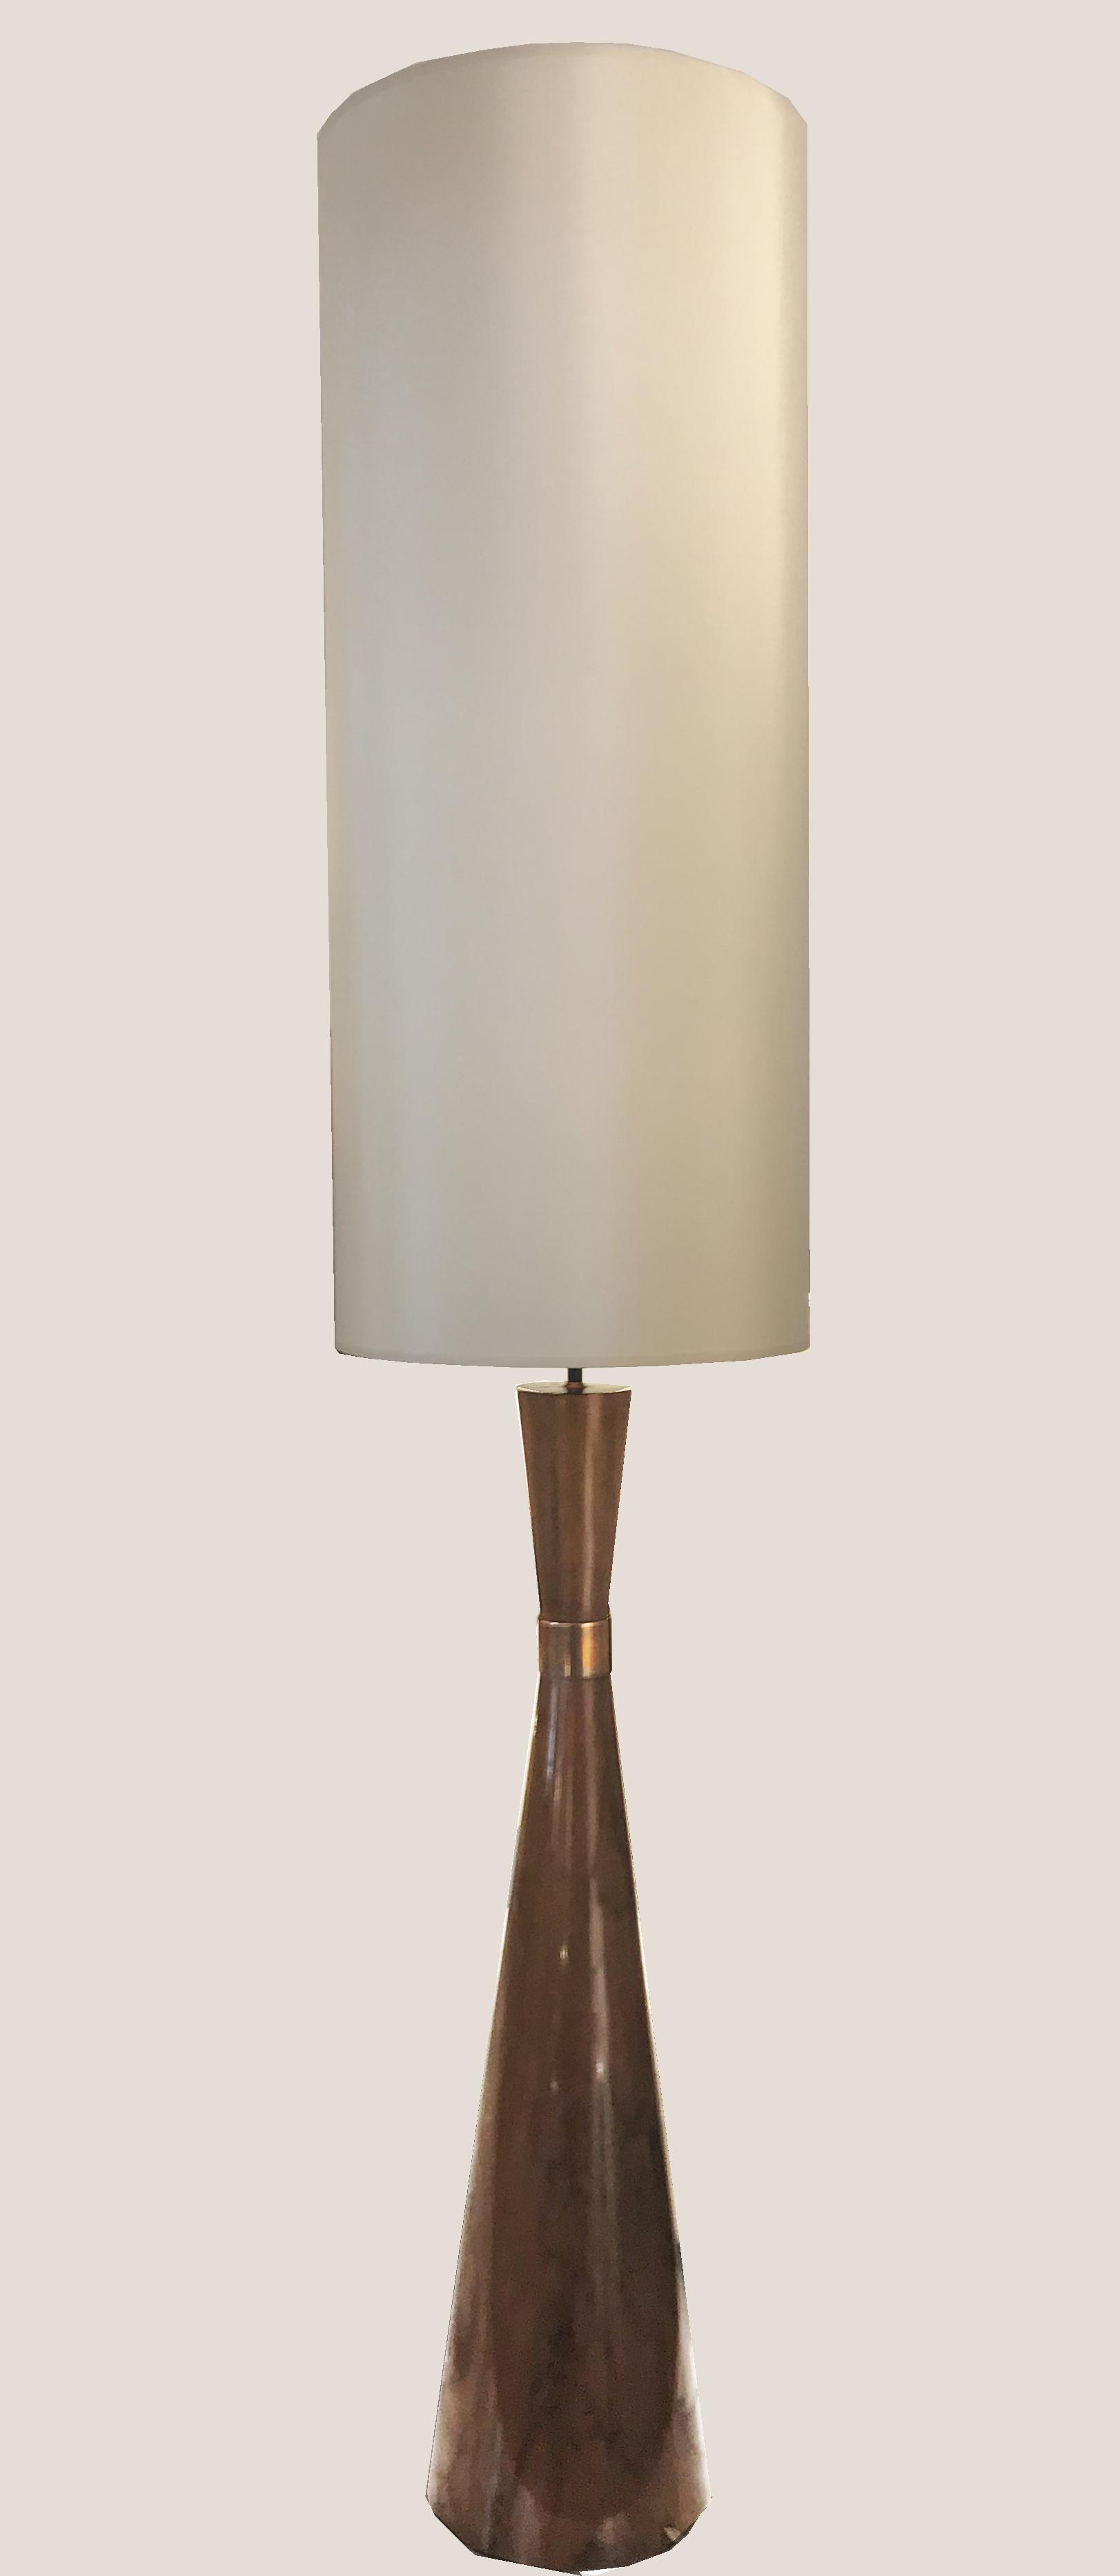 Grand lampadaire